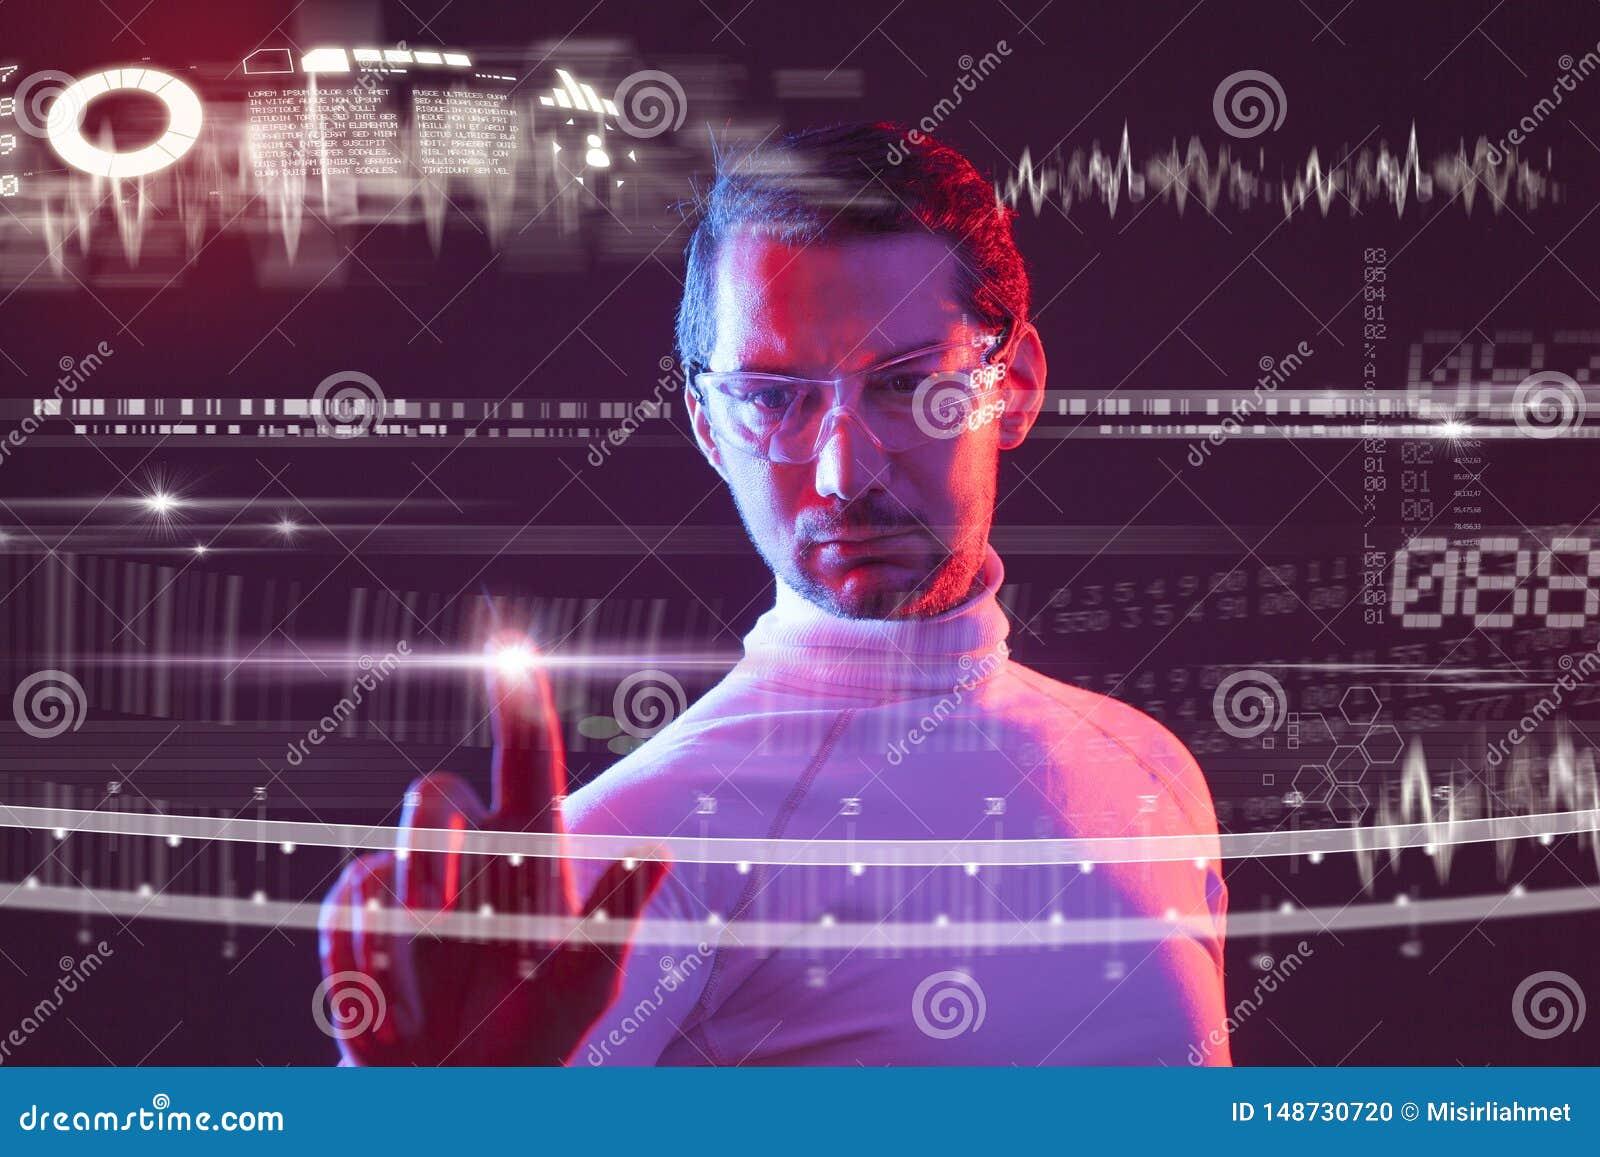 Mens wat betreft de virtuele toekomstige interface